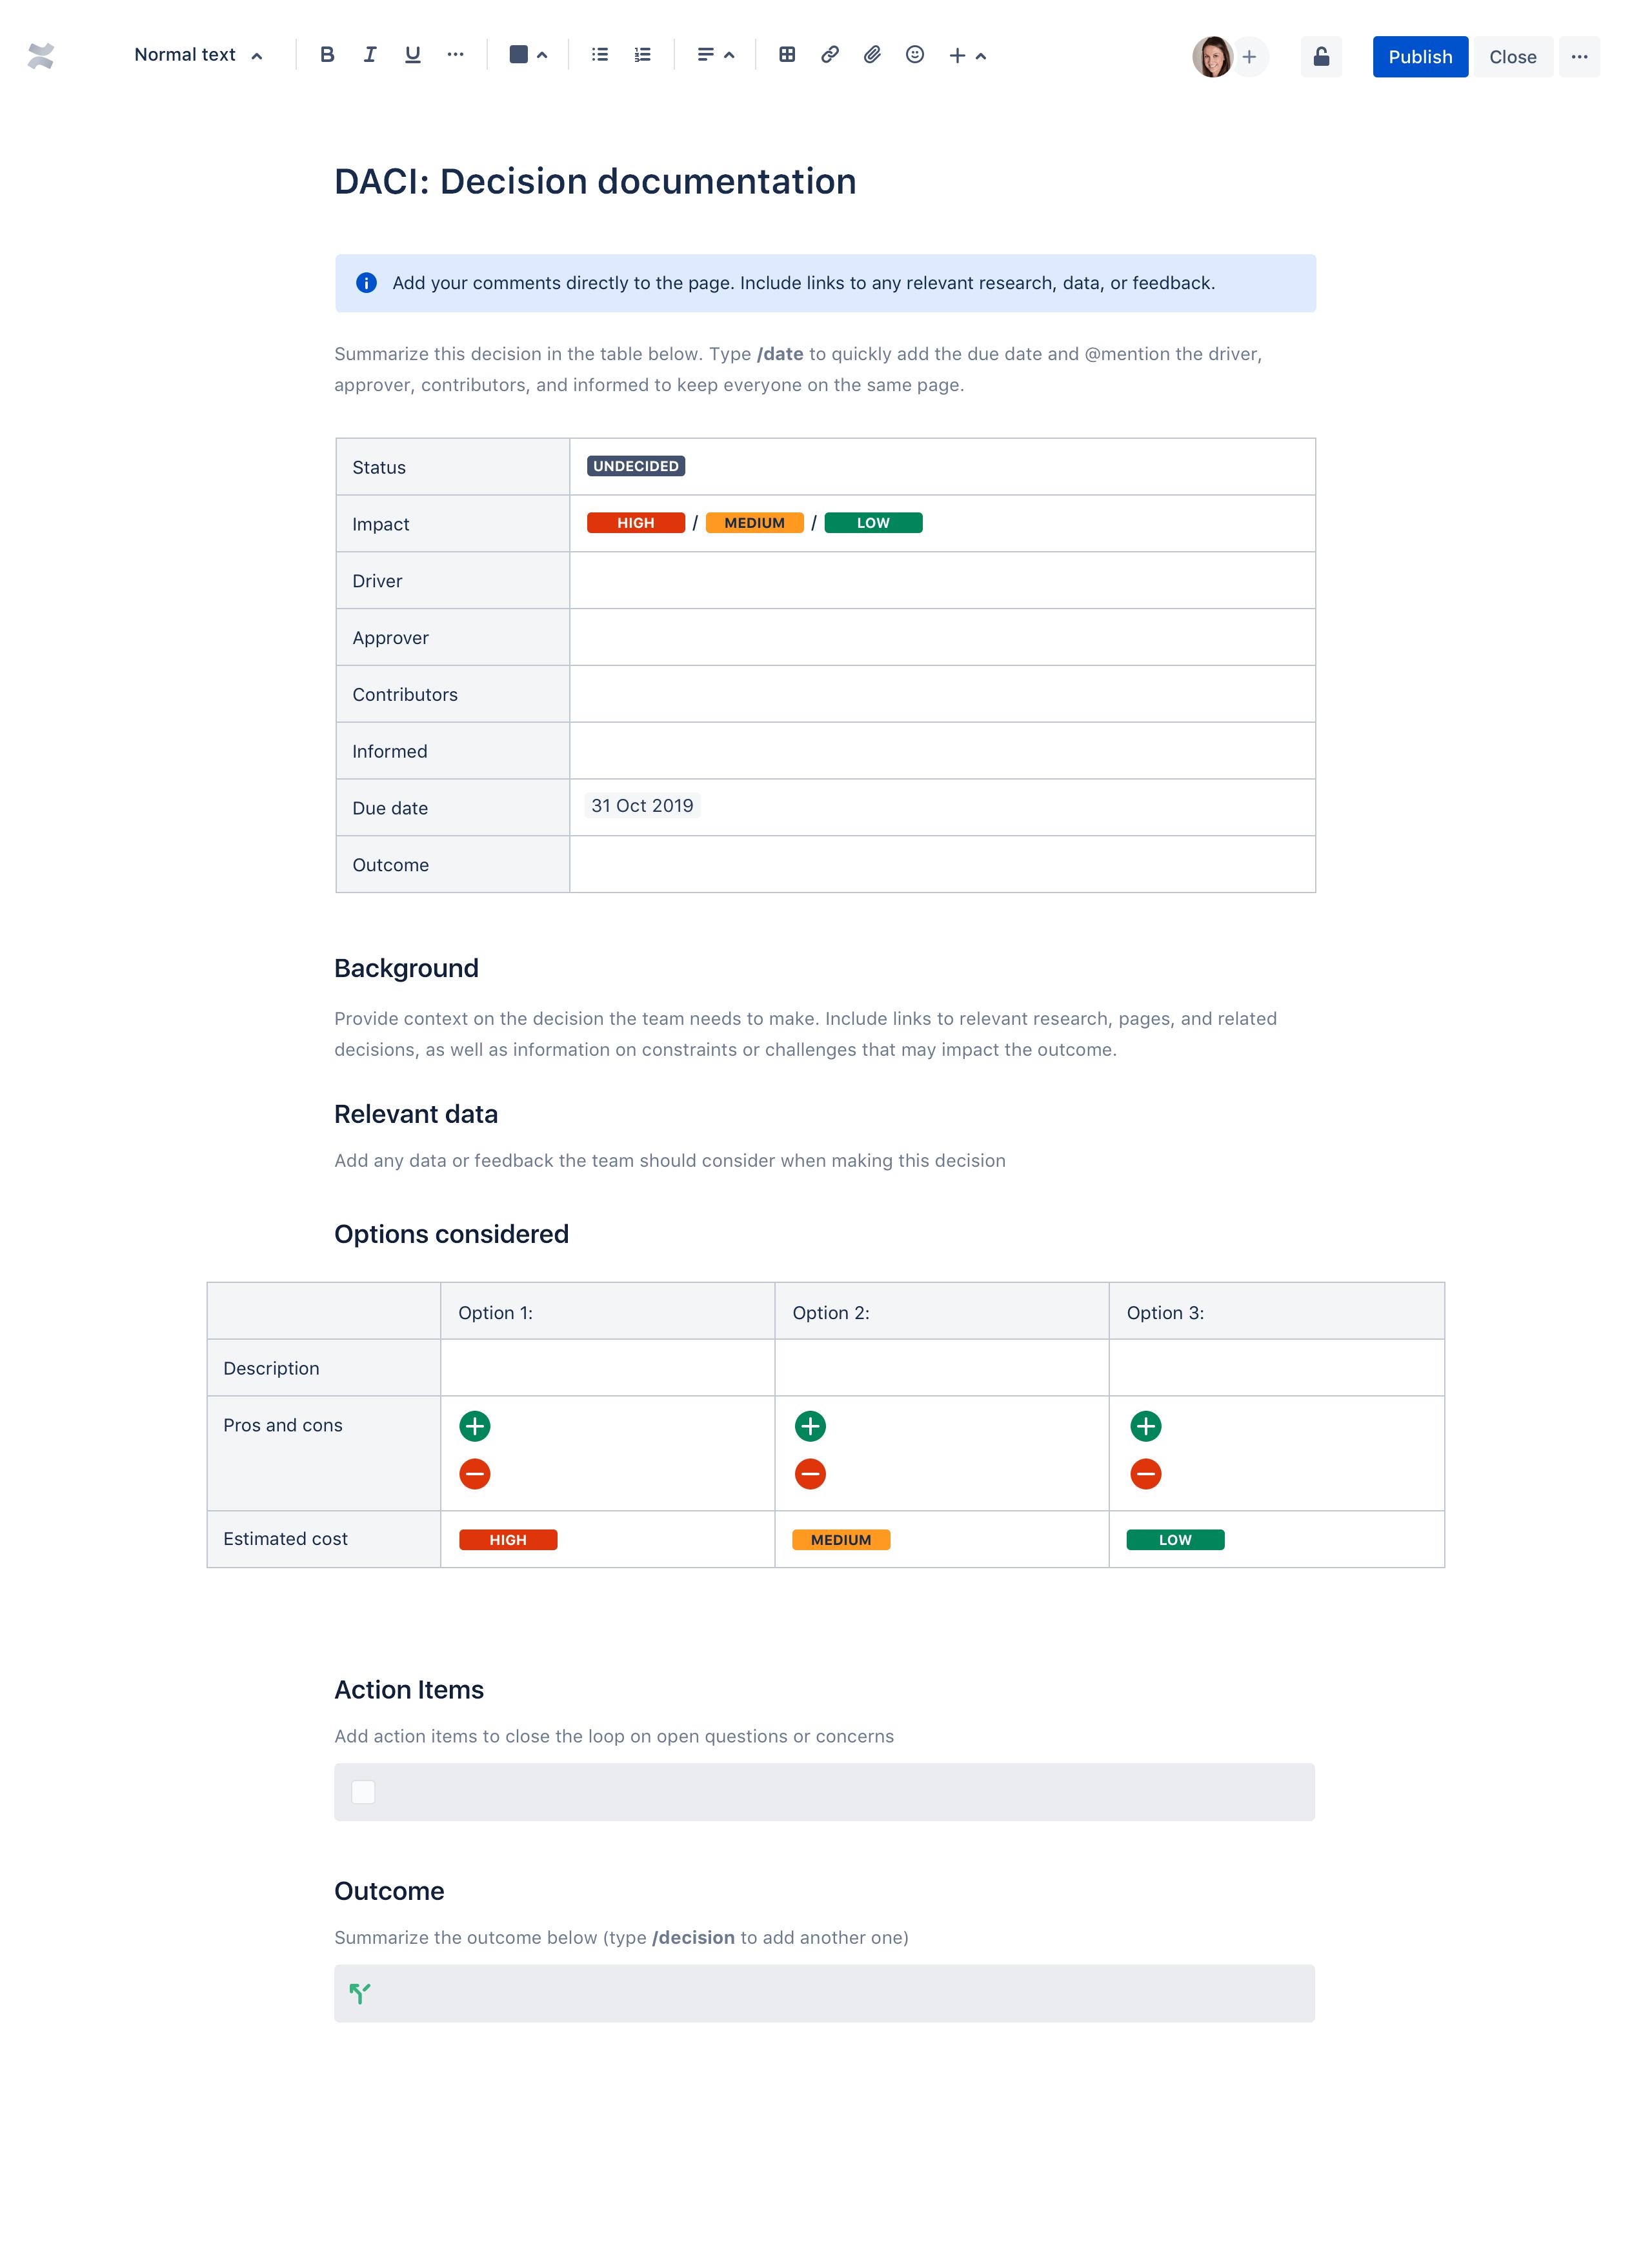 DACI: Decision documentation